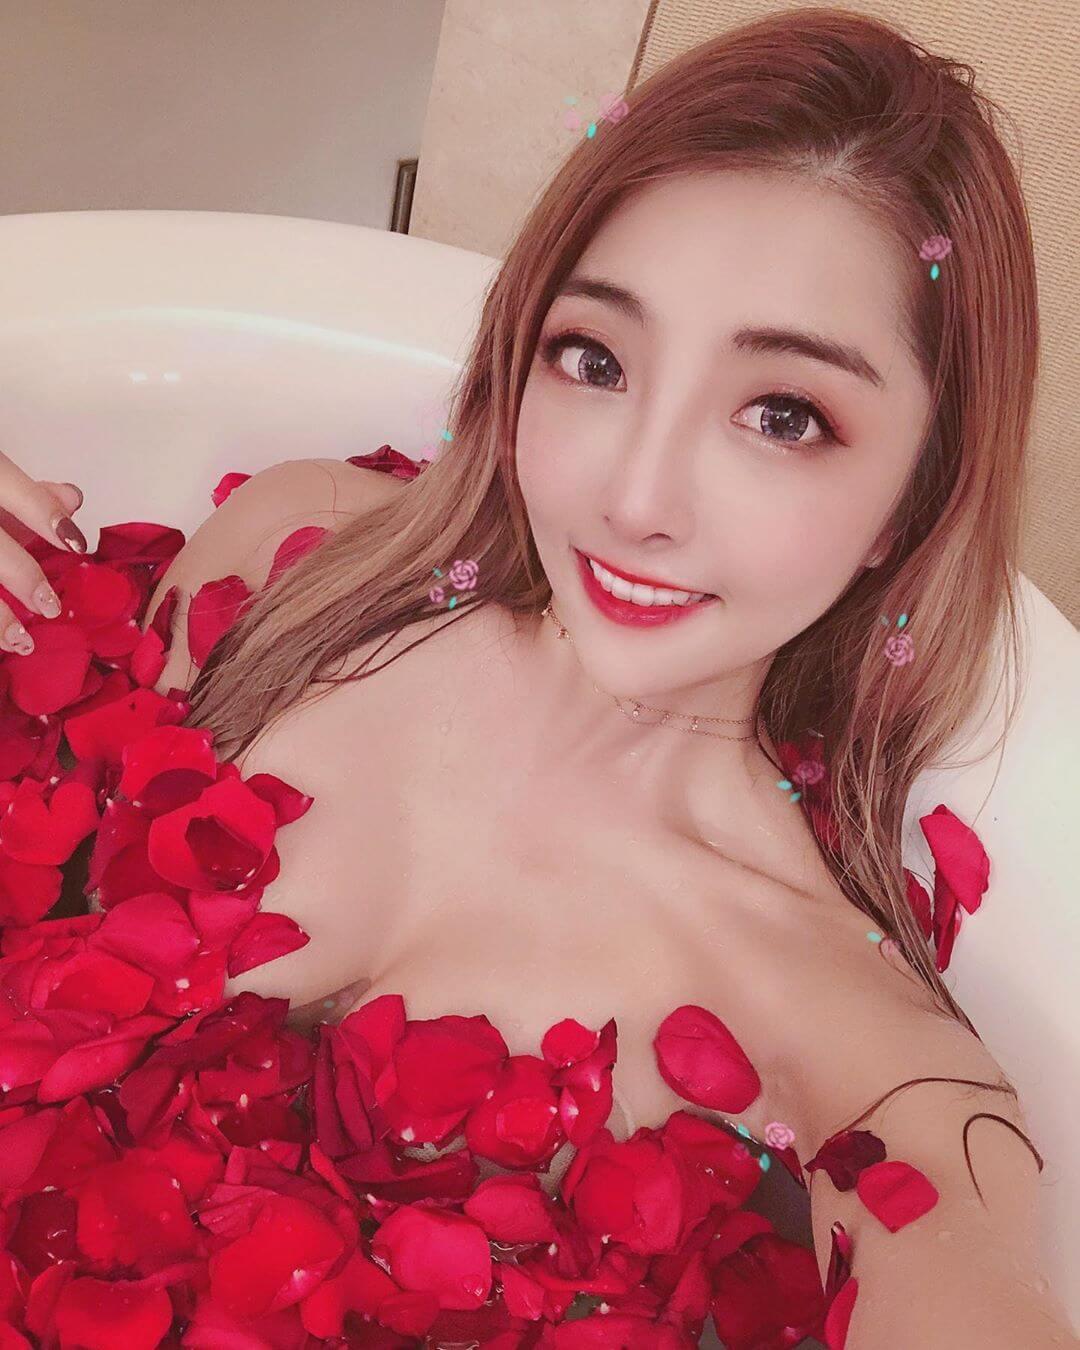 Lola 蘿拉 - 佳玲李